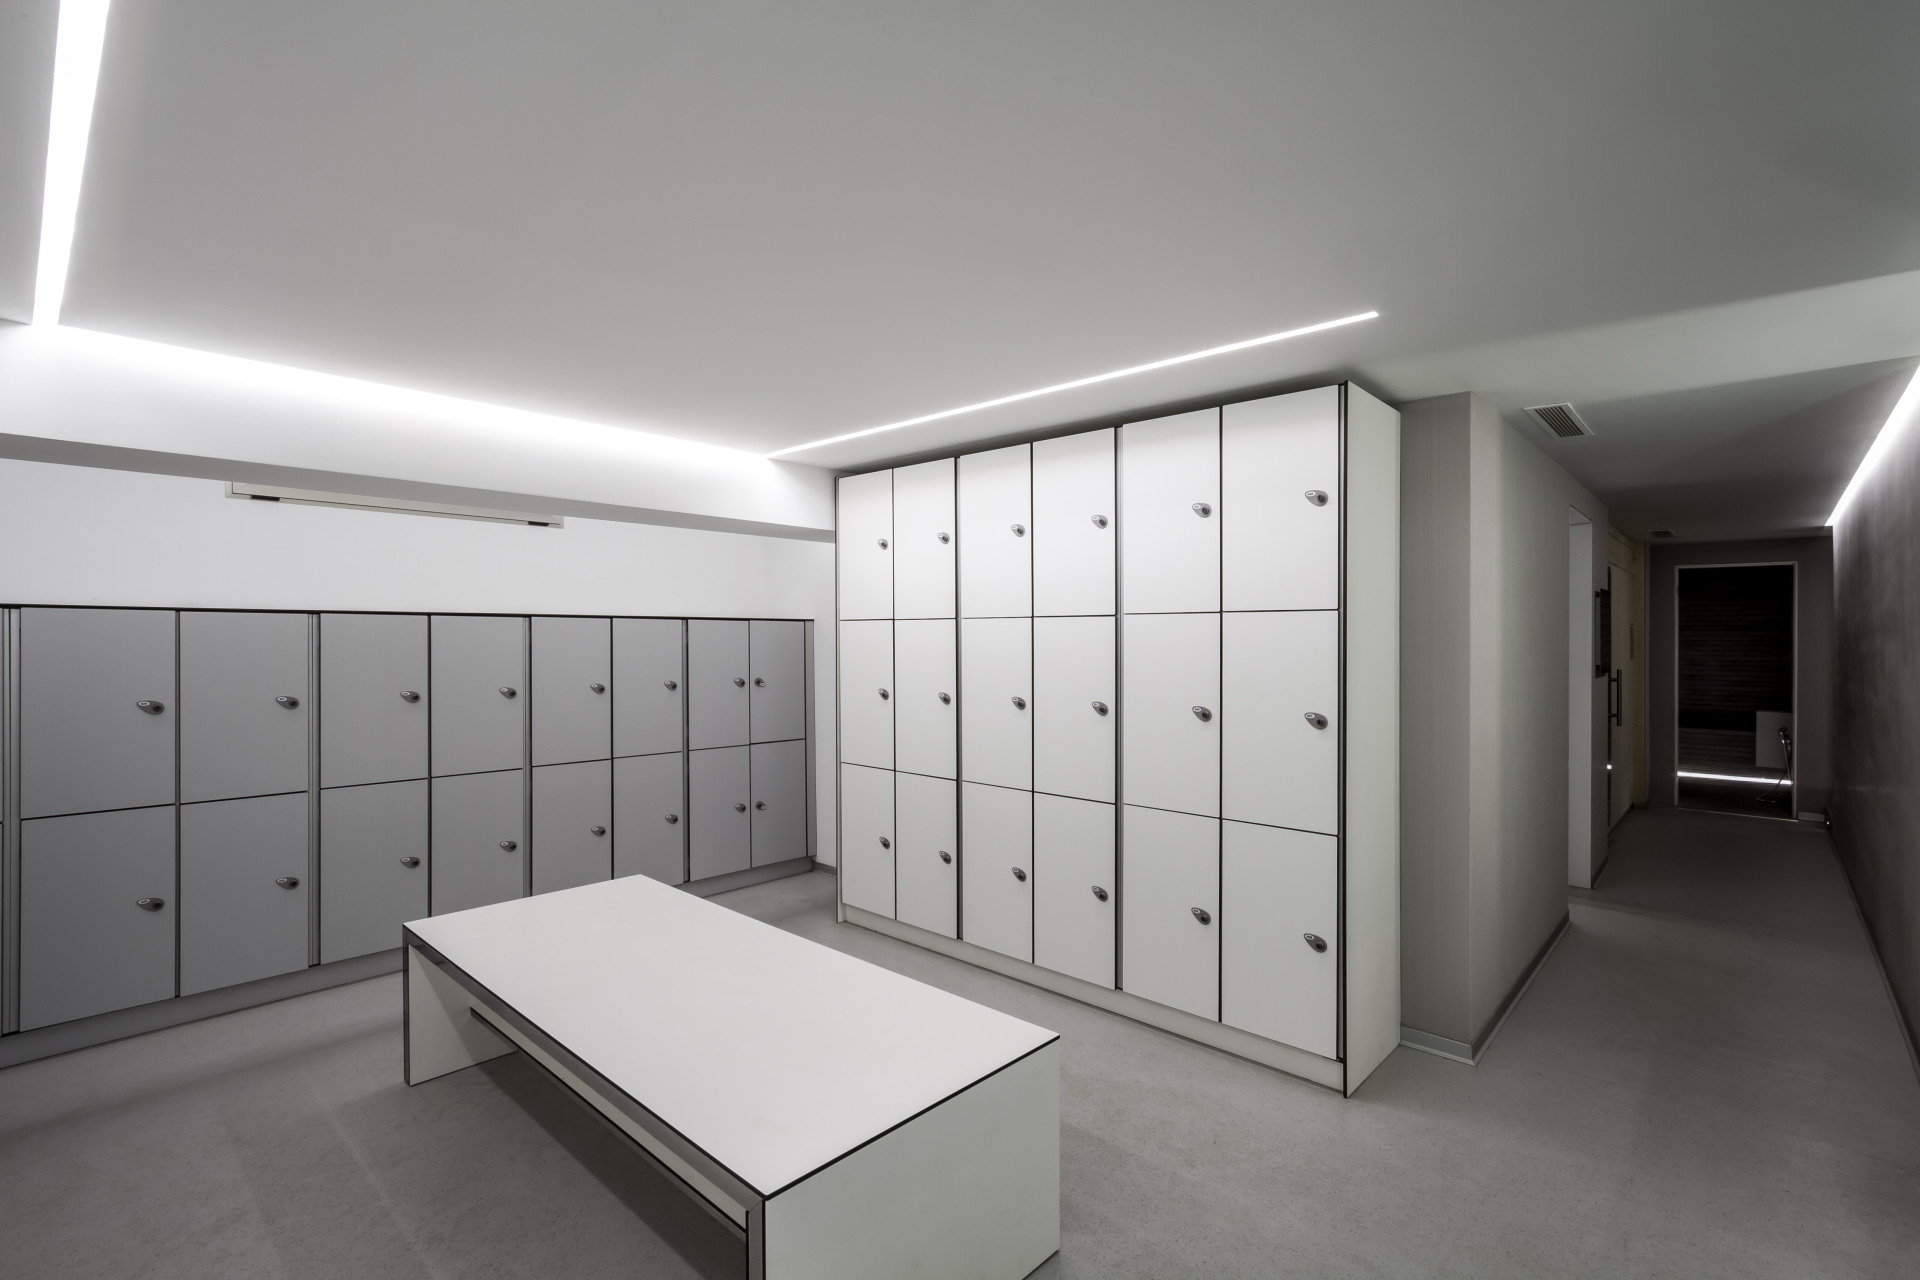 fotografia-arquitectura-valencia-german-cabo-bfm-edificatoria-club-tenis (16)